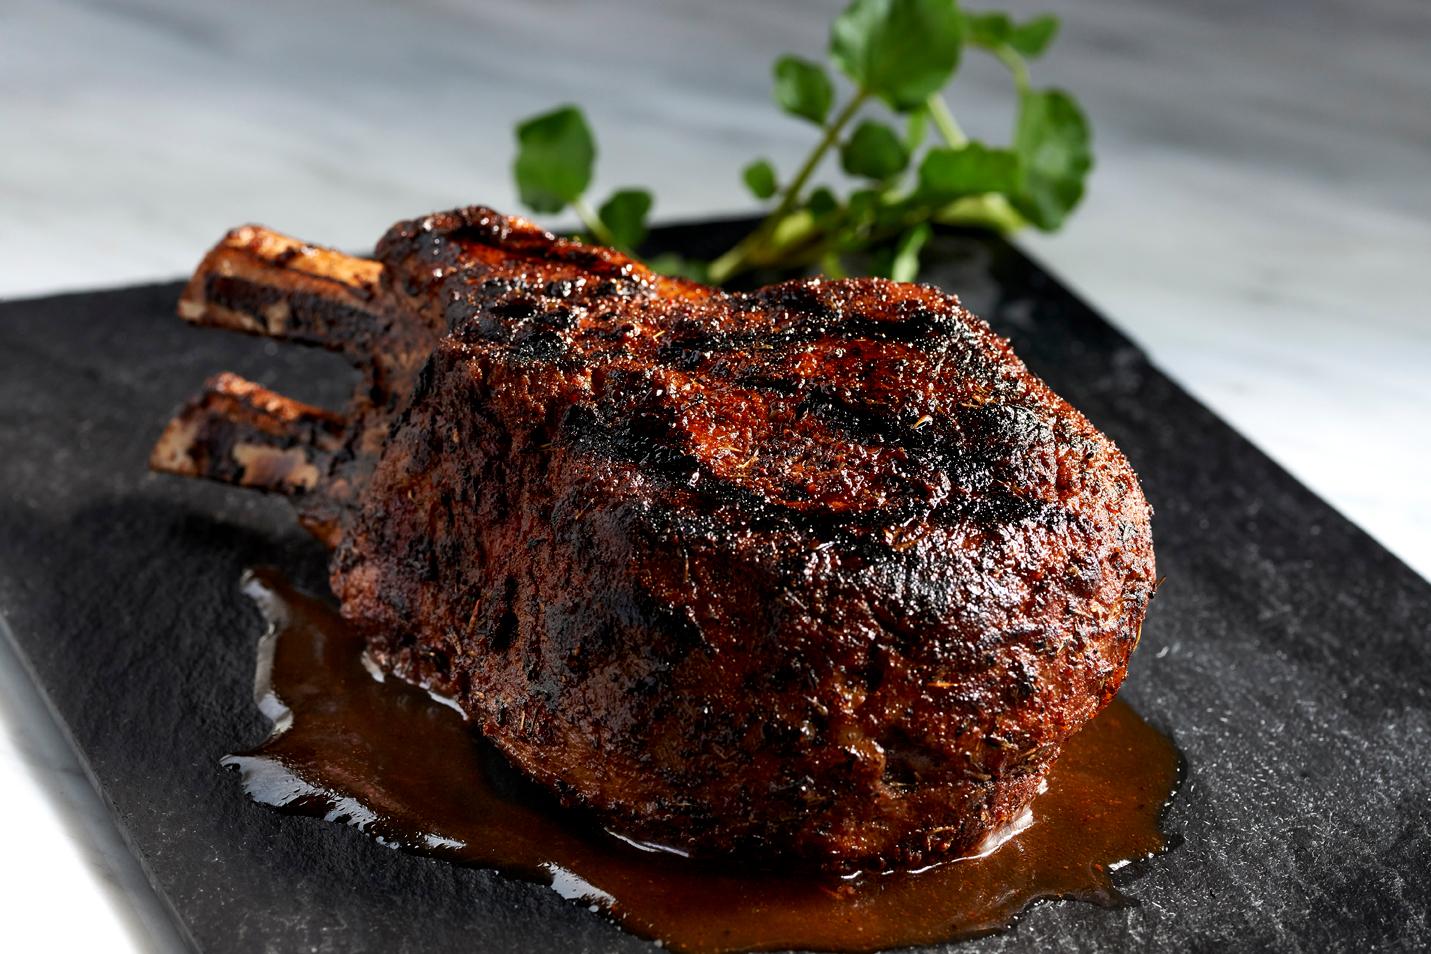 Morton S The Steakhouse 888 W Big Beaver Rd Ste 111 Troy